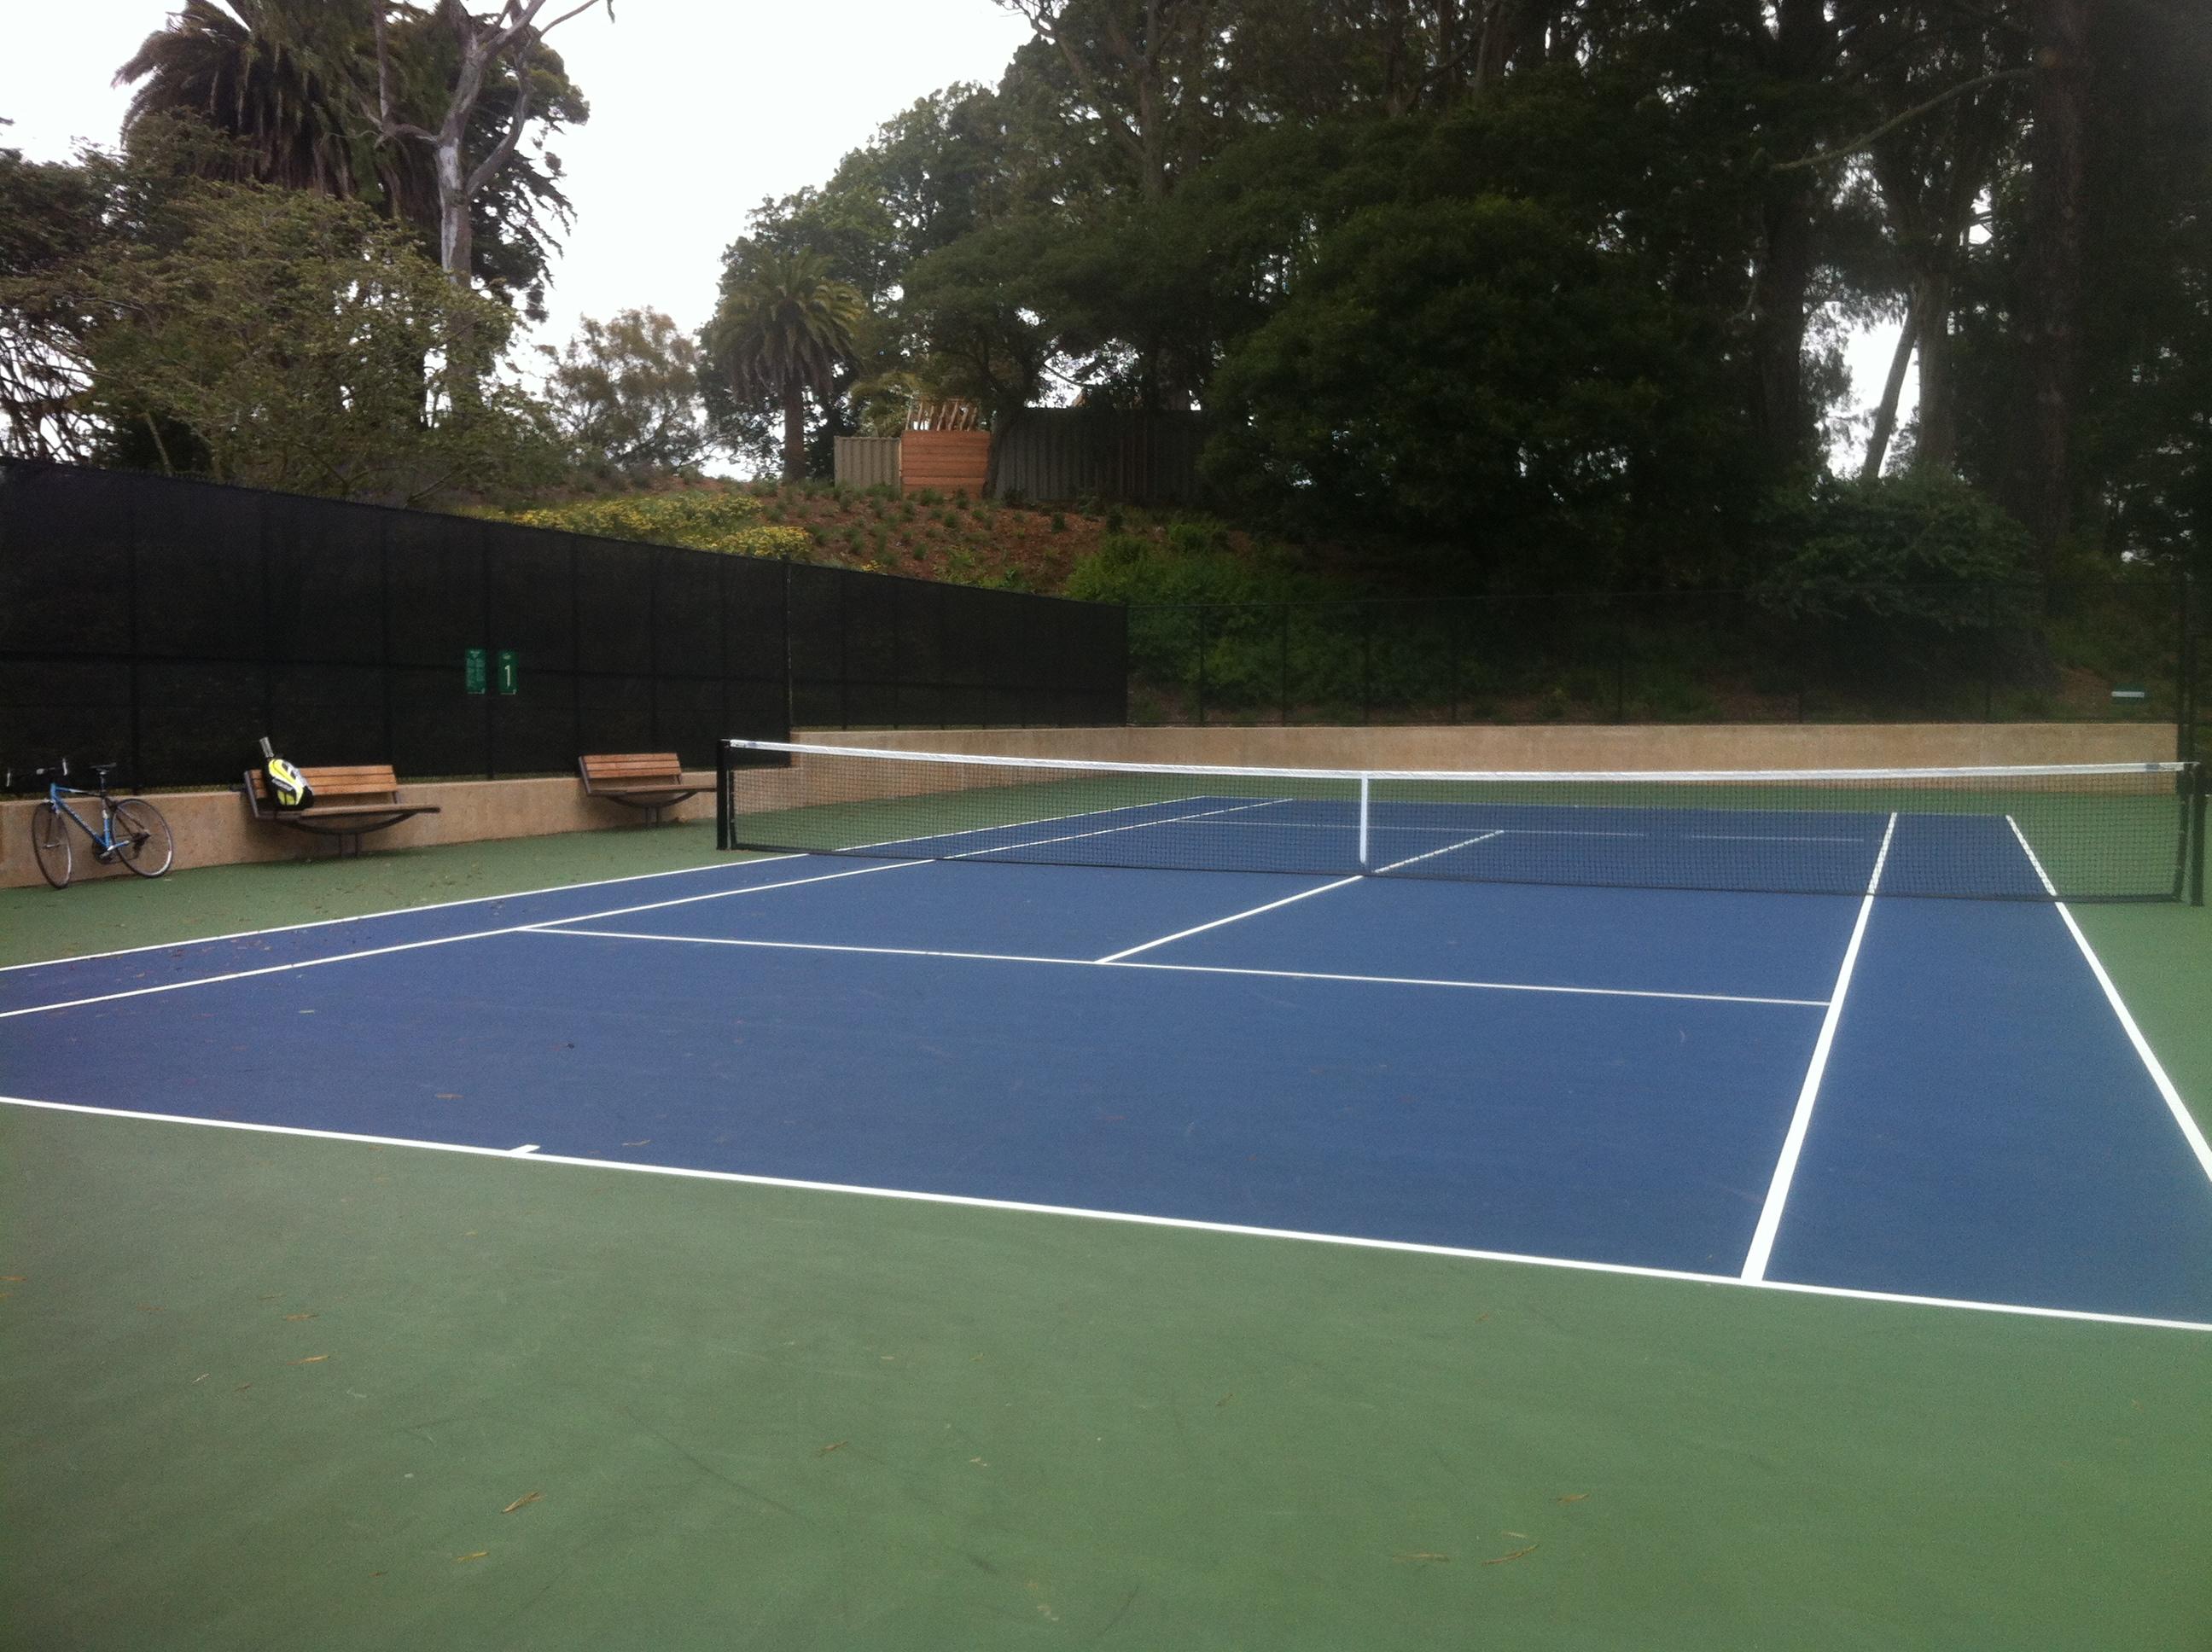 Tennis Center Near Me